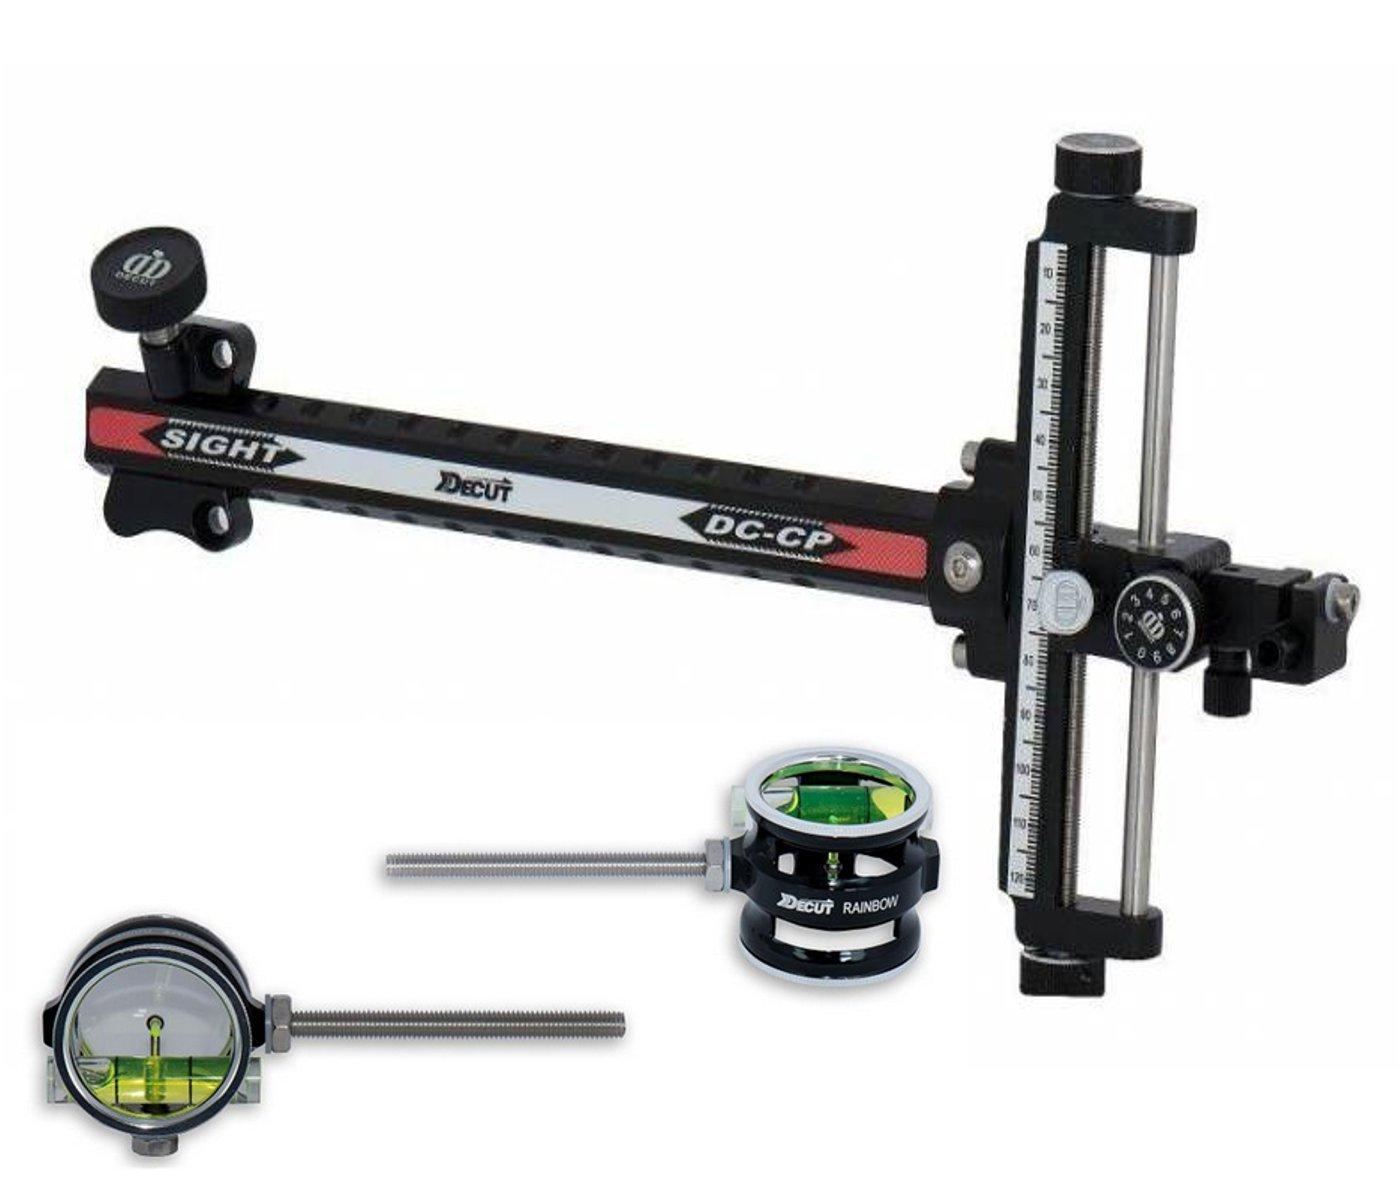 1.00 Decut Archery Compound Bow Sight Black Rainbow Scope